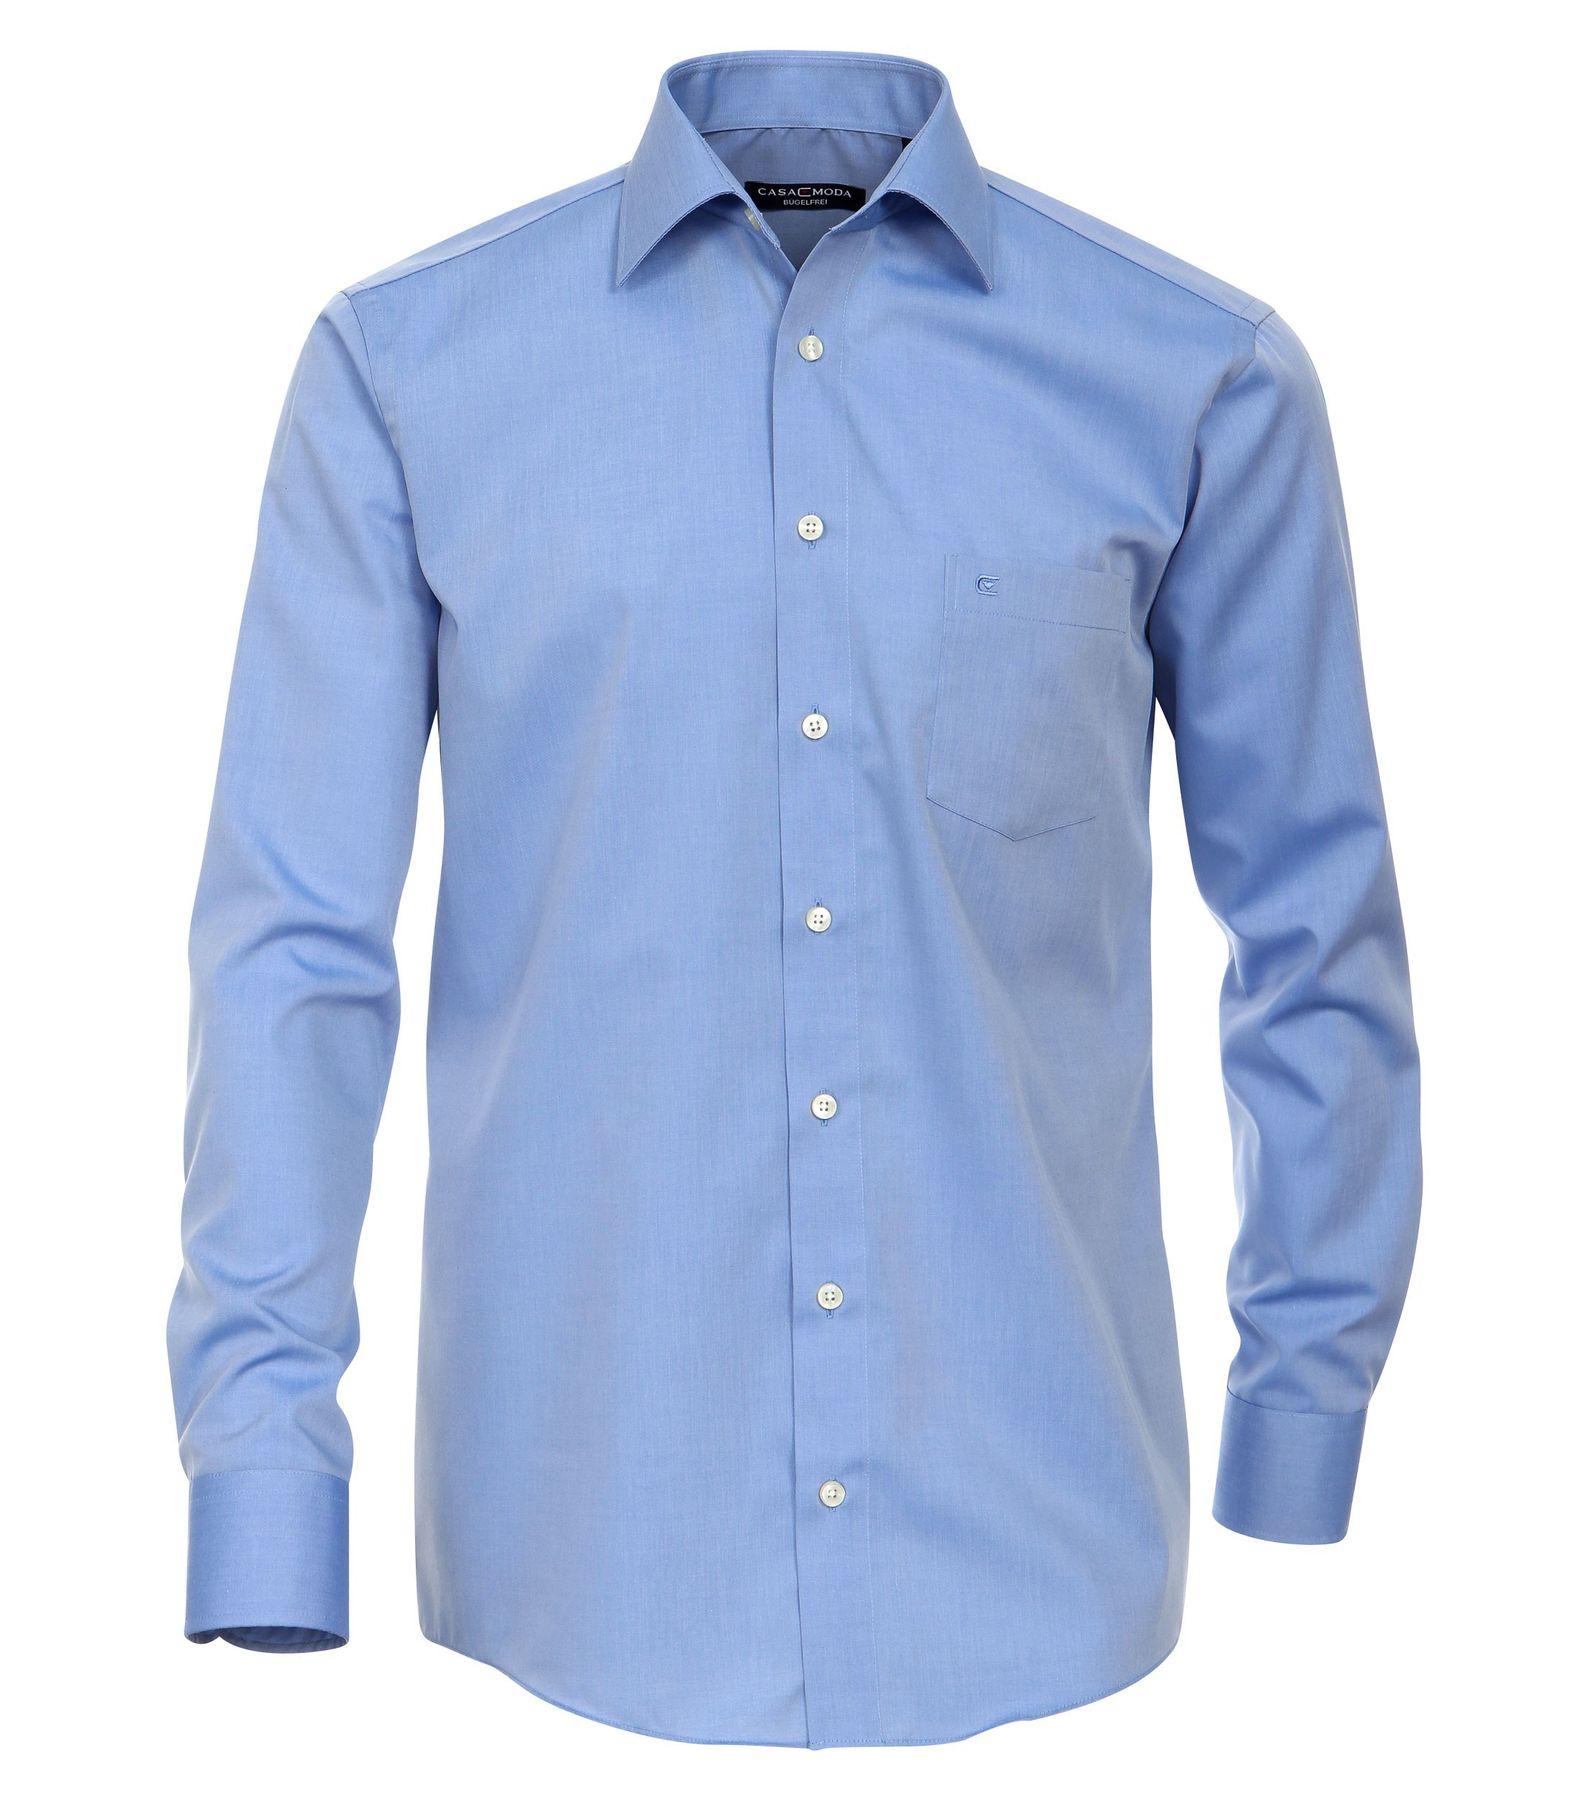 Casa Moda - Comfort Fit - Bügelfreies Herren Business Langarm Hemd verschiedene Farben (006060A) – Bild 13